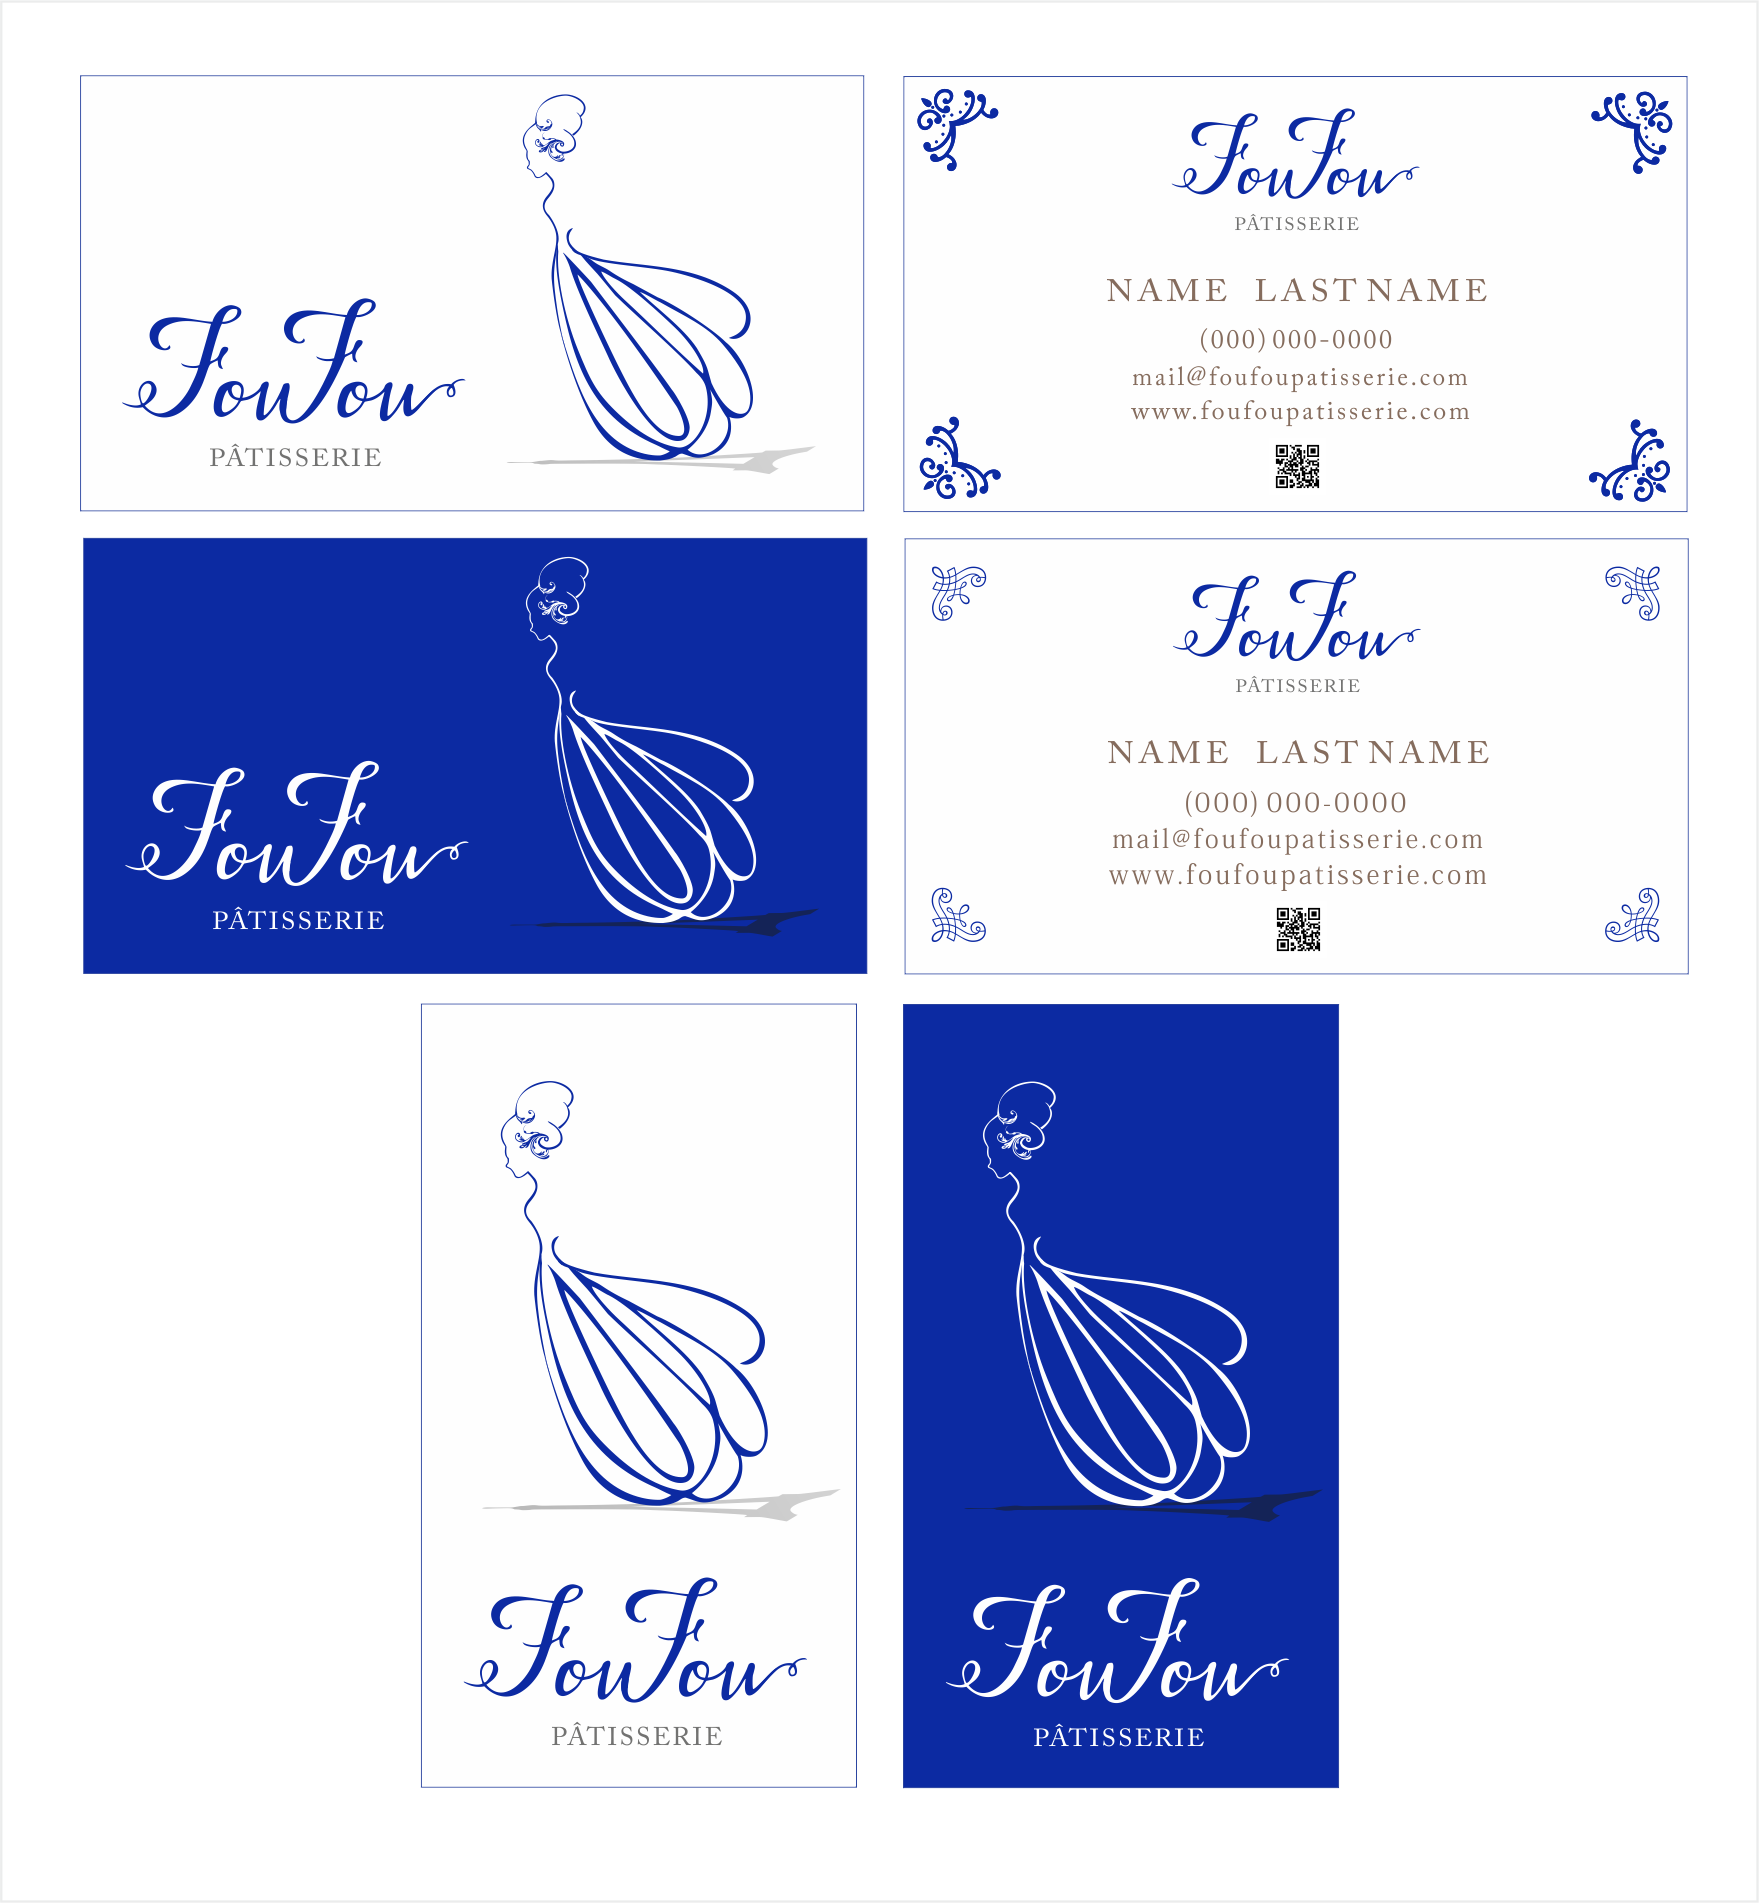 SOS: creative & elegant logo for luxury French Pastry brand